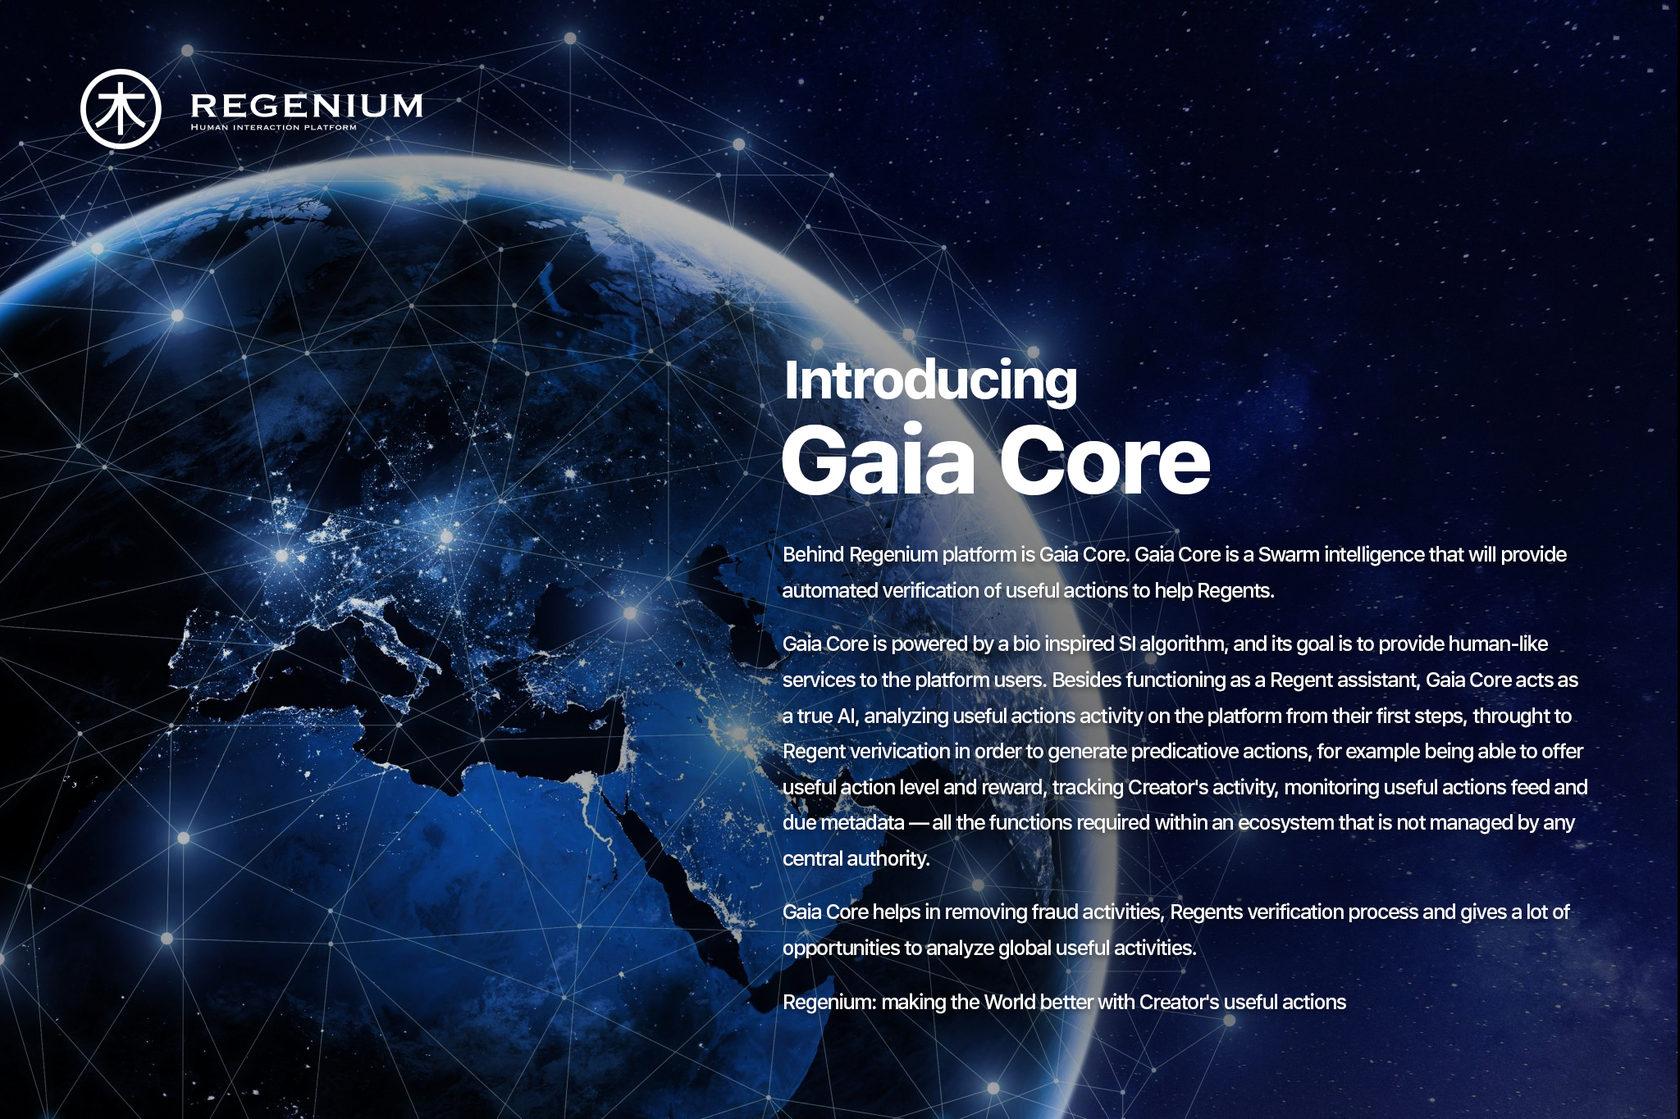 Regenium - Human interaction platform